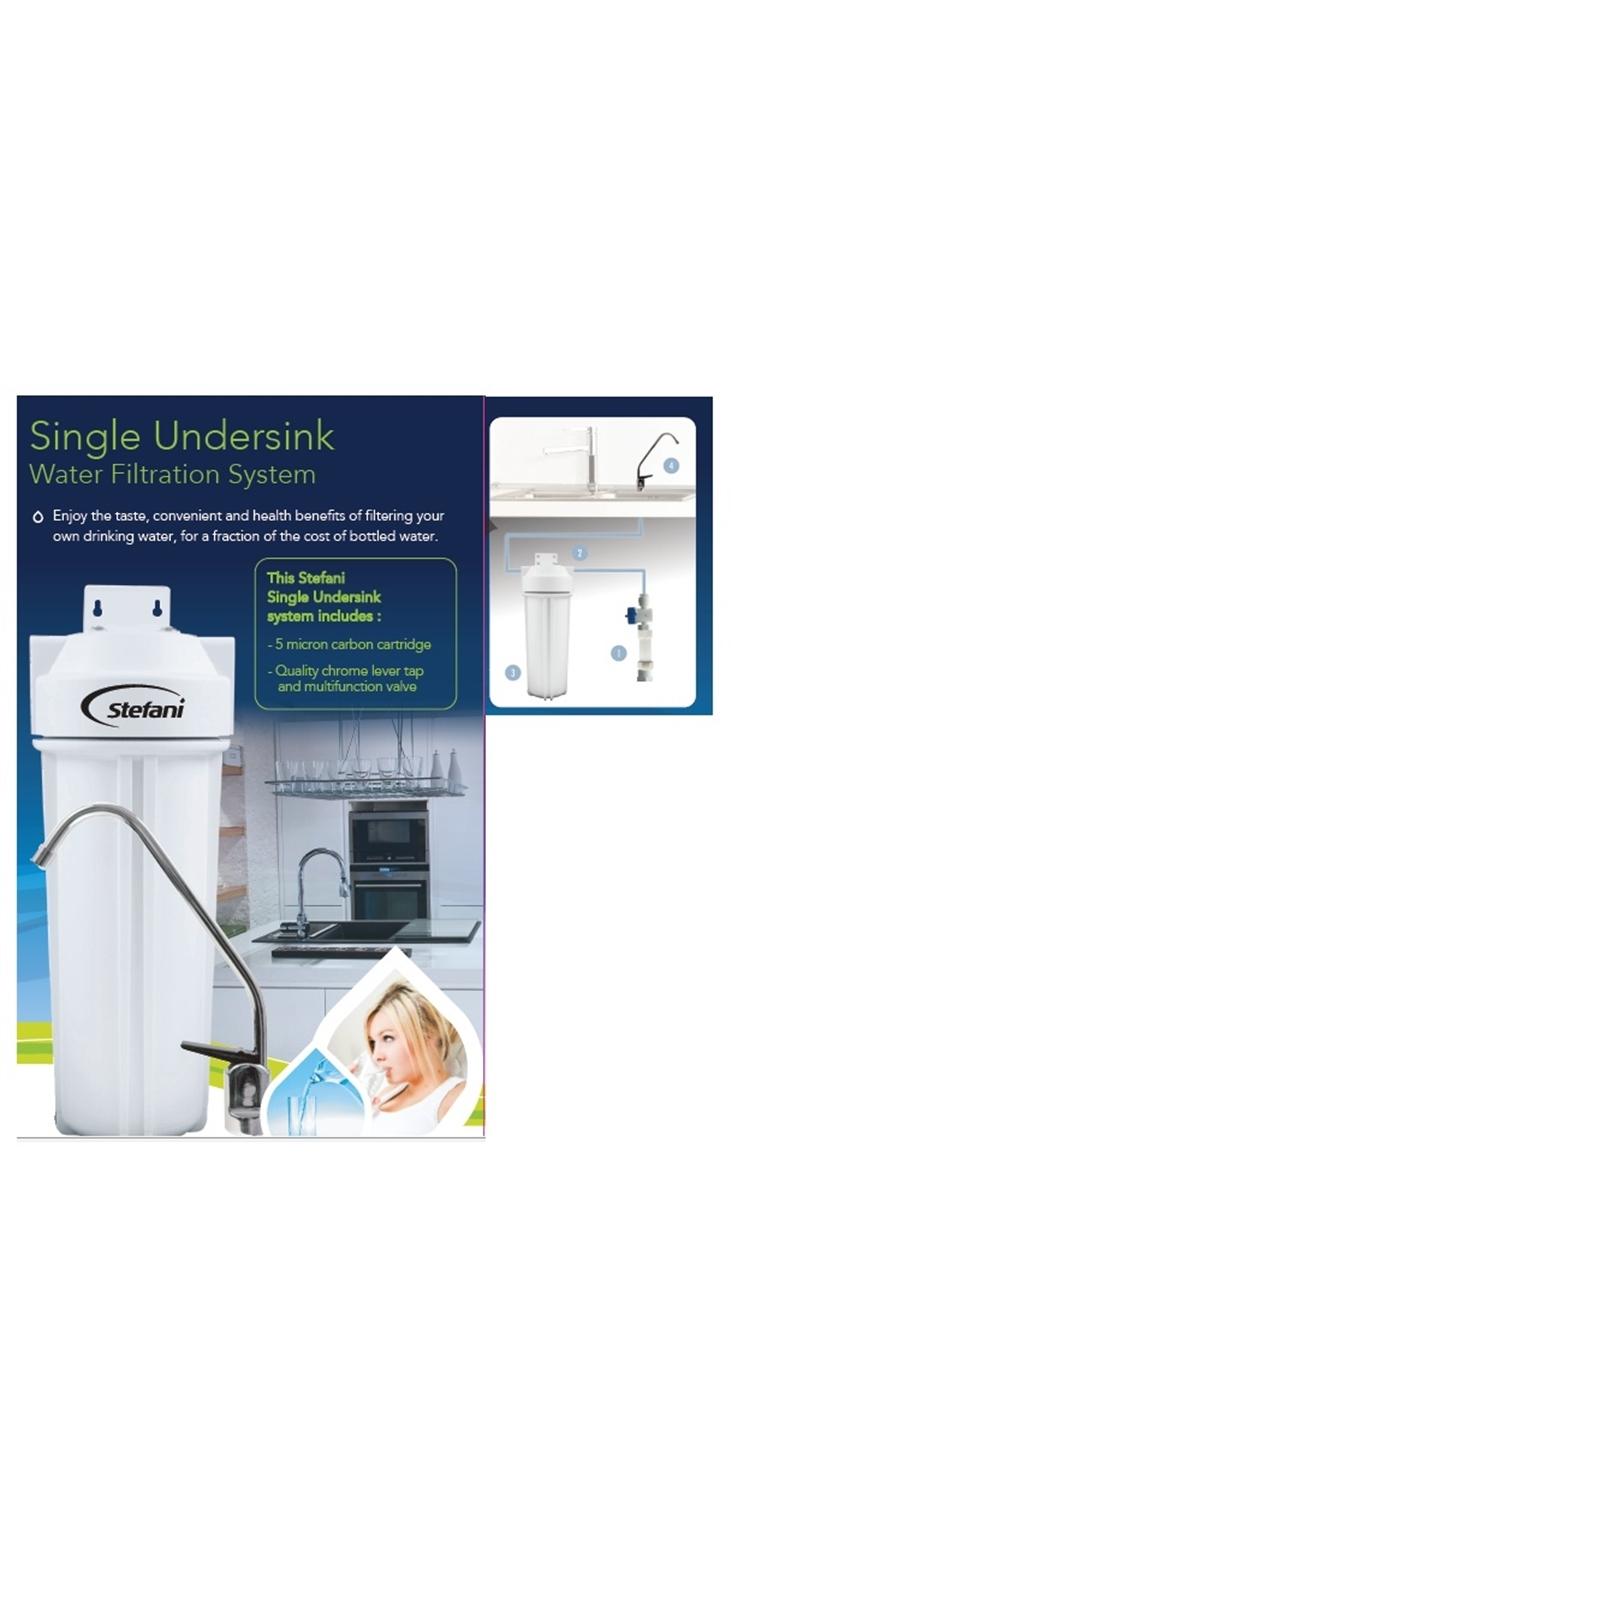 Stefani Single Undercounter Water Filter System